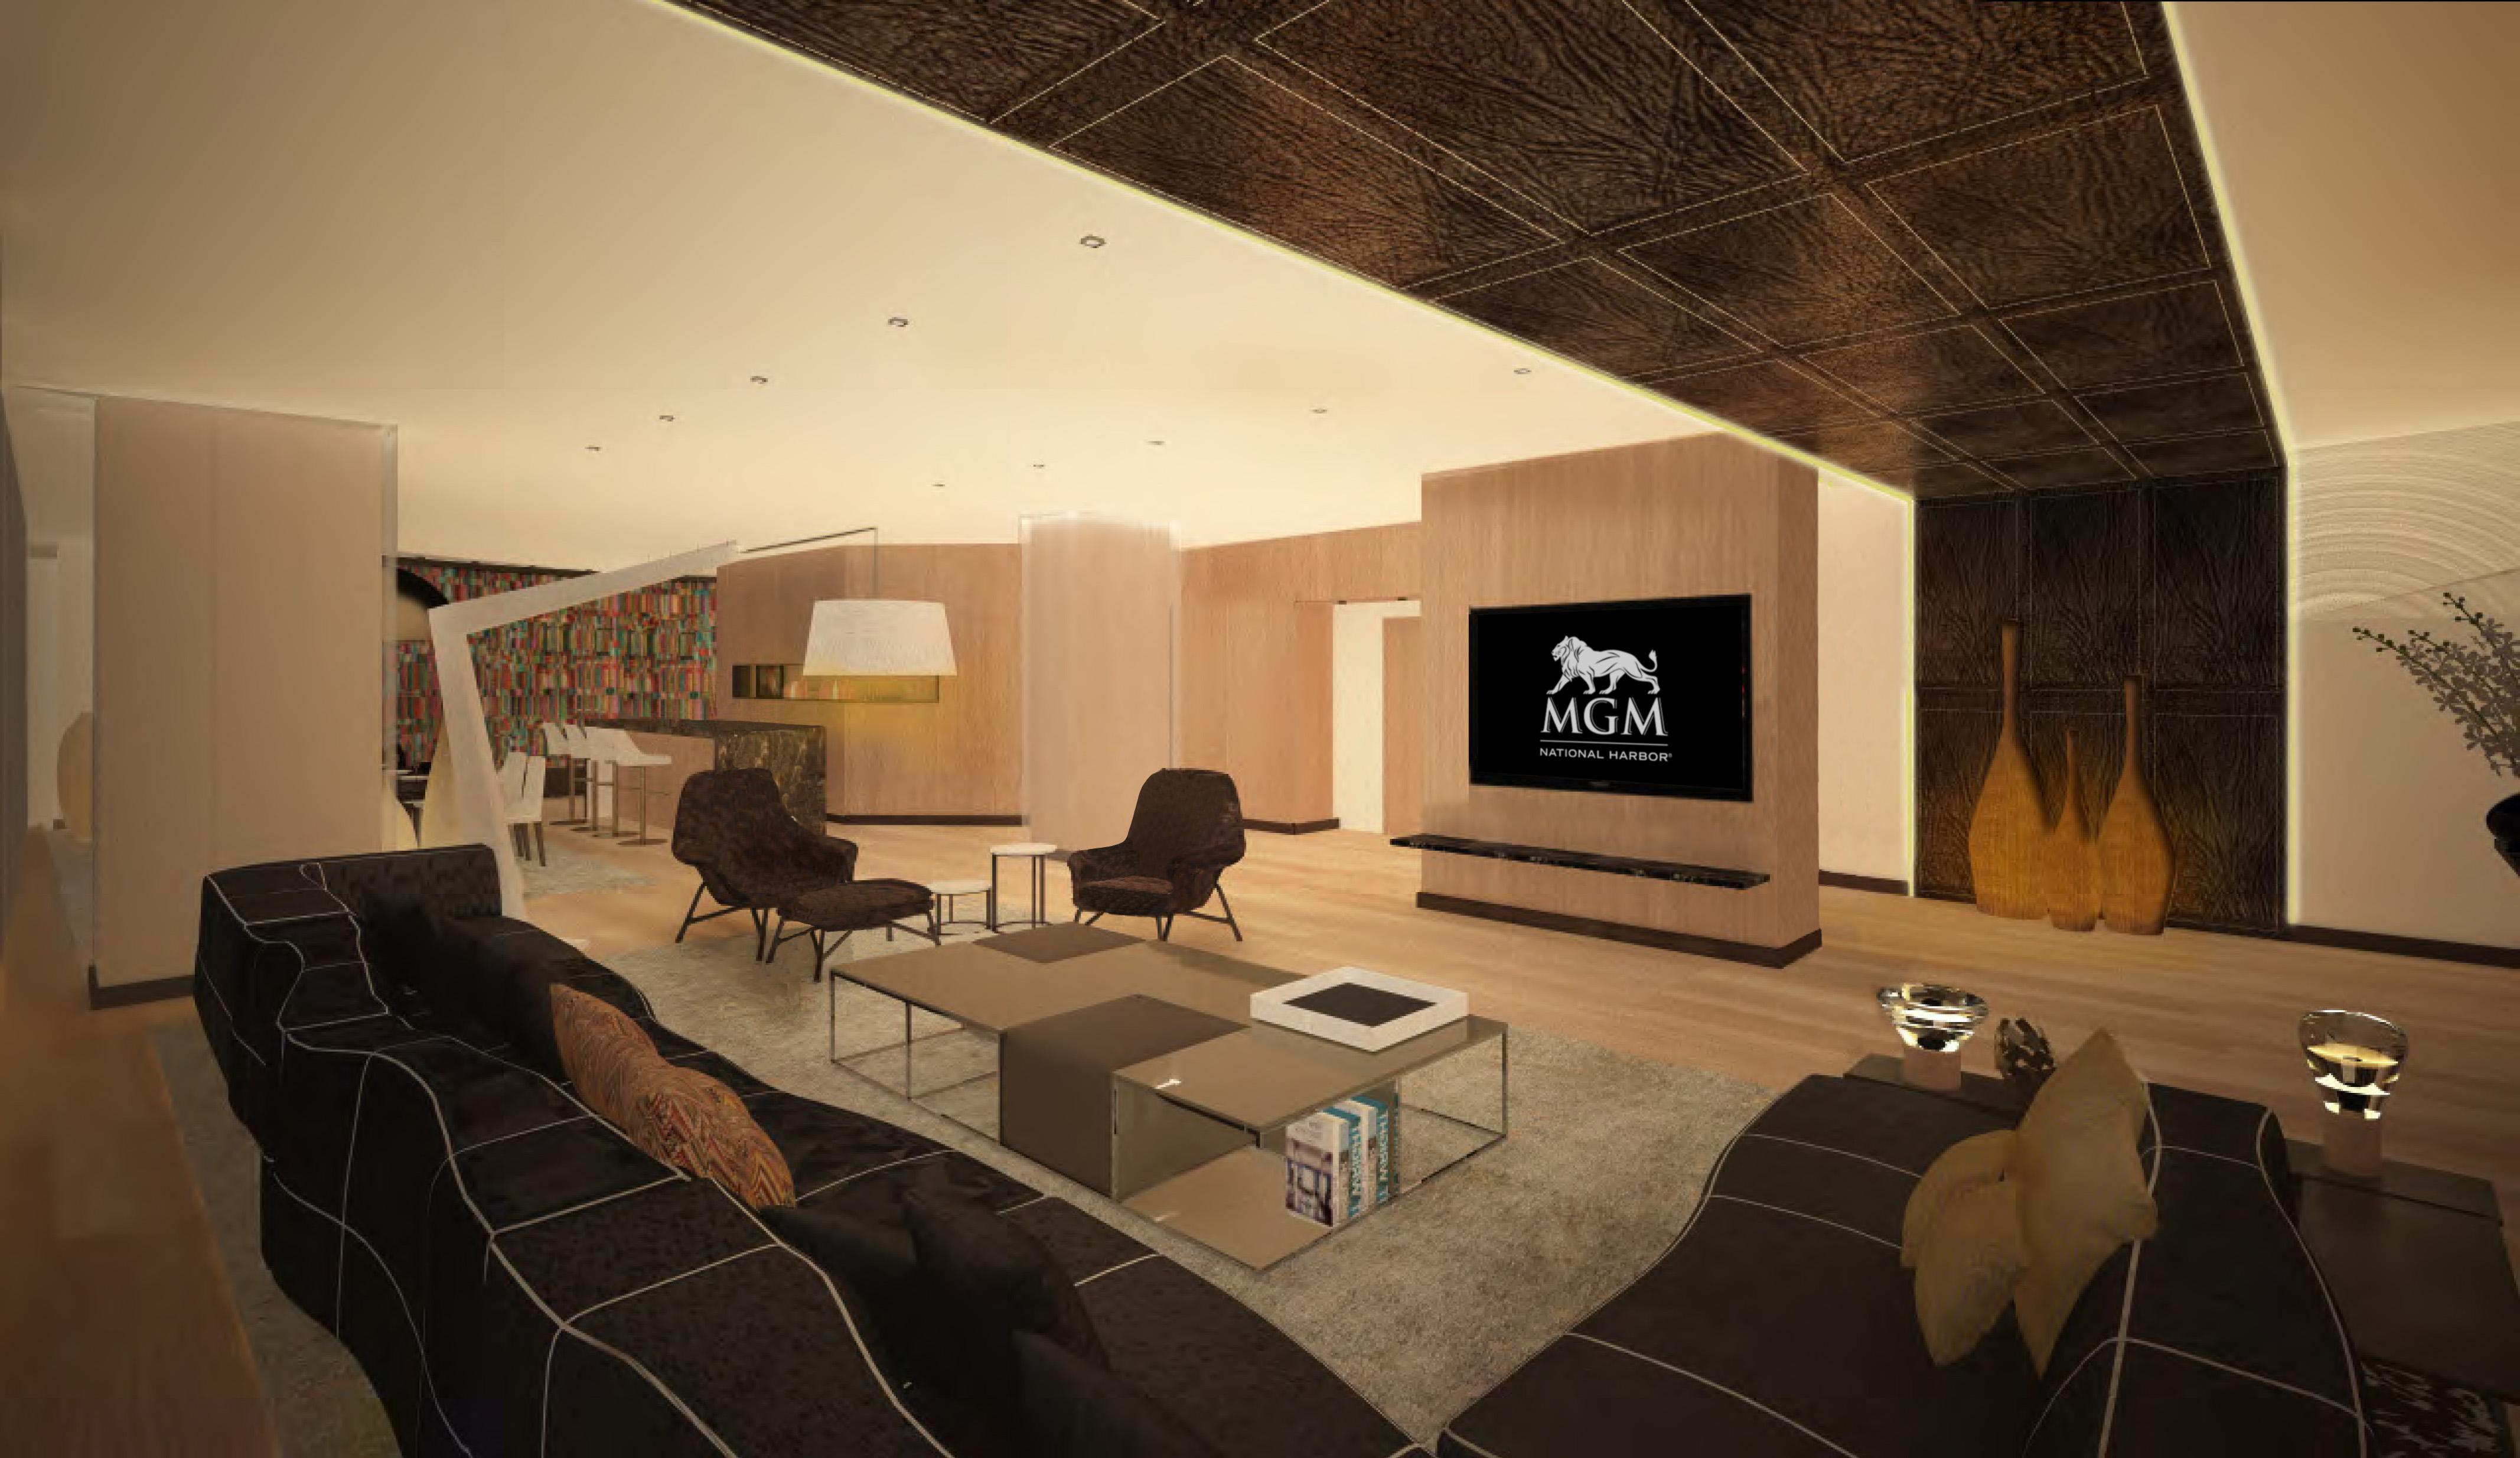 Sneak peek: Inside an MGM National Harbor suite (Photos) | WTOP